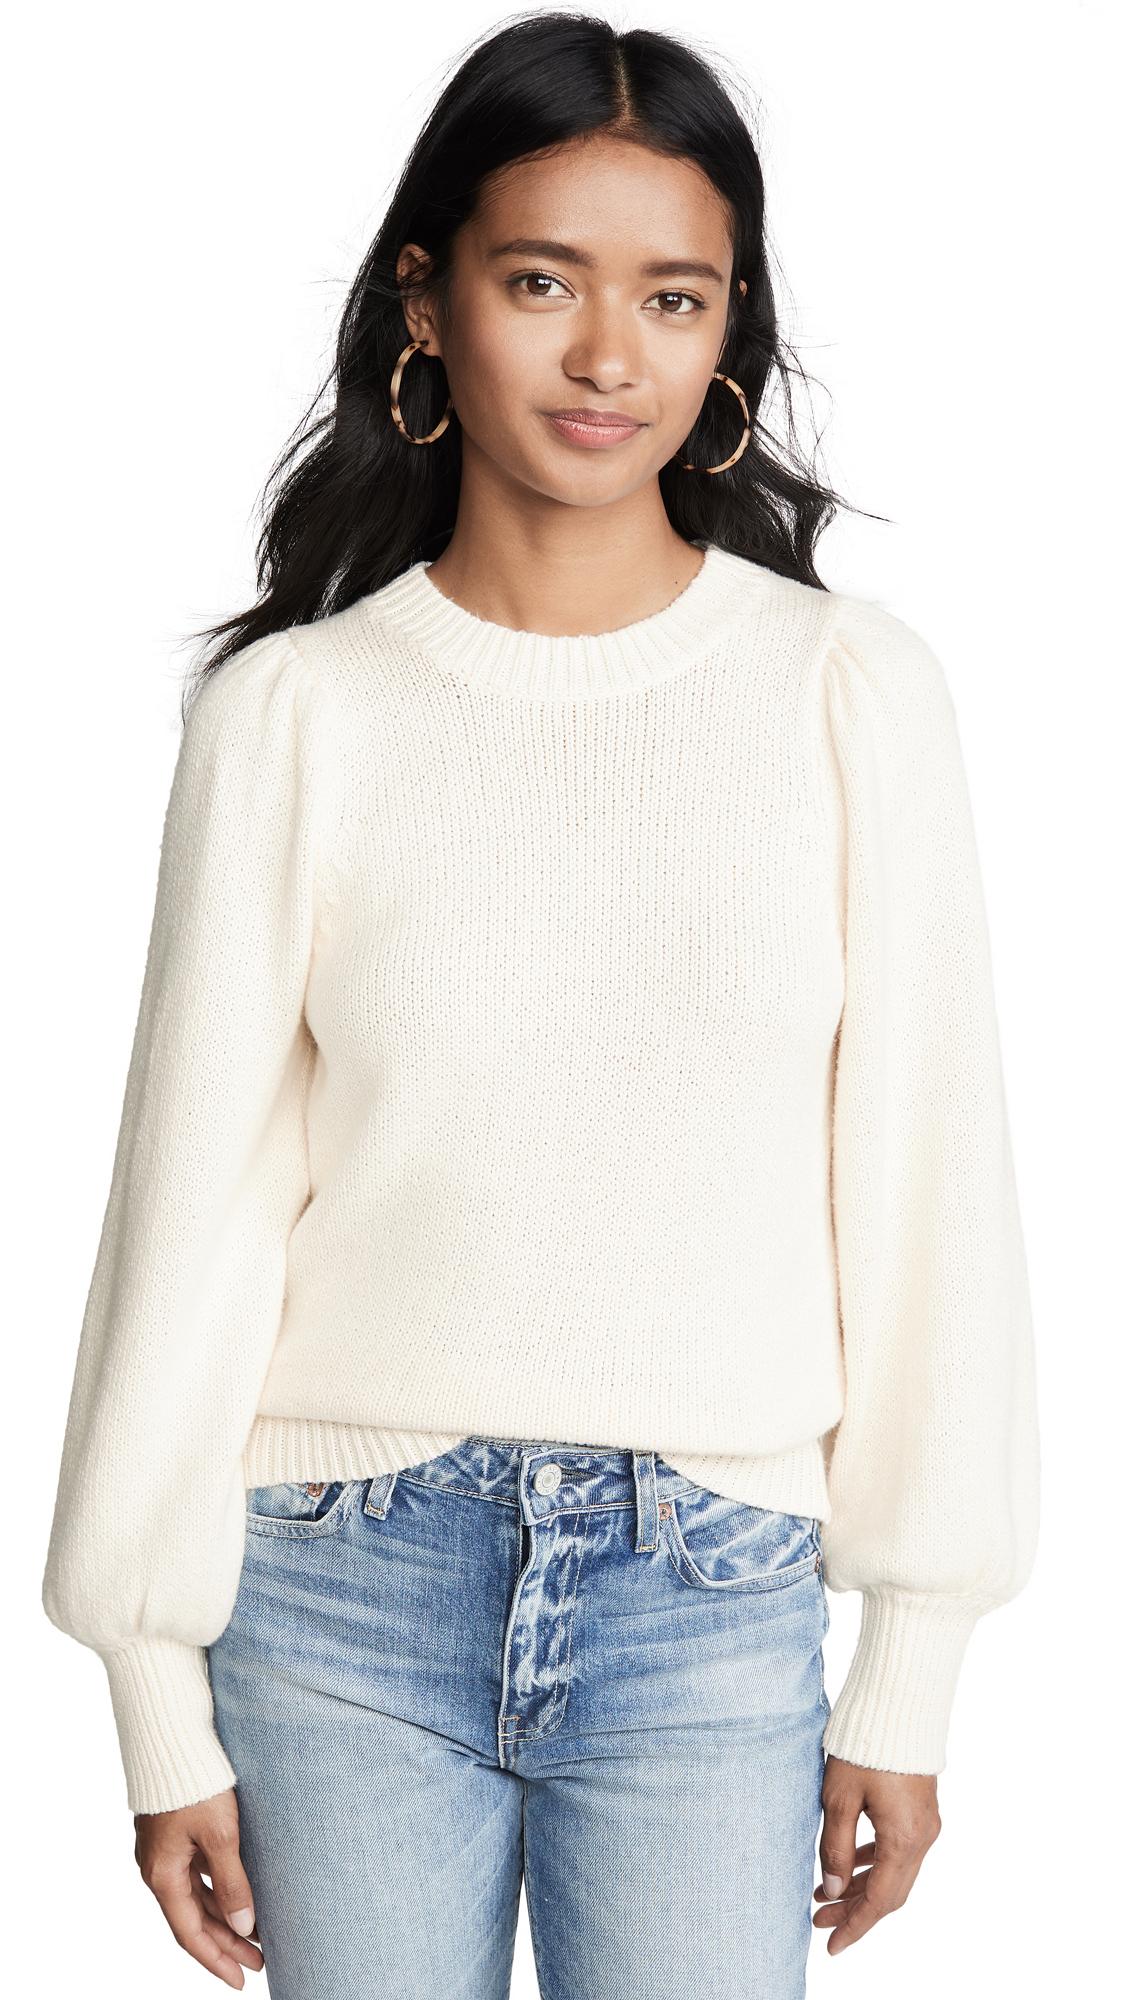 525 Puff Sleeve Crew Sweater